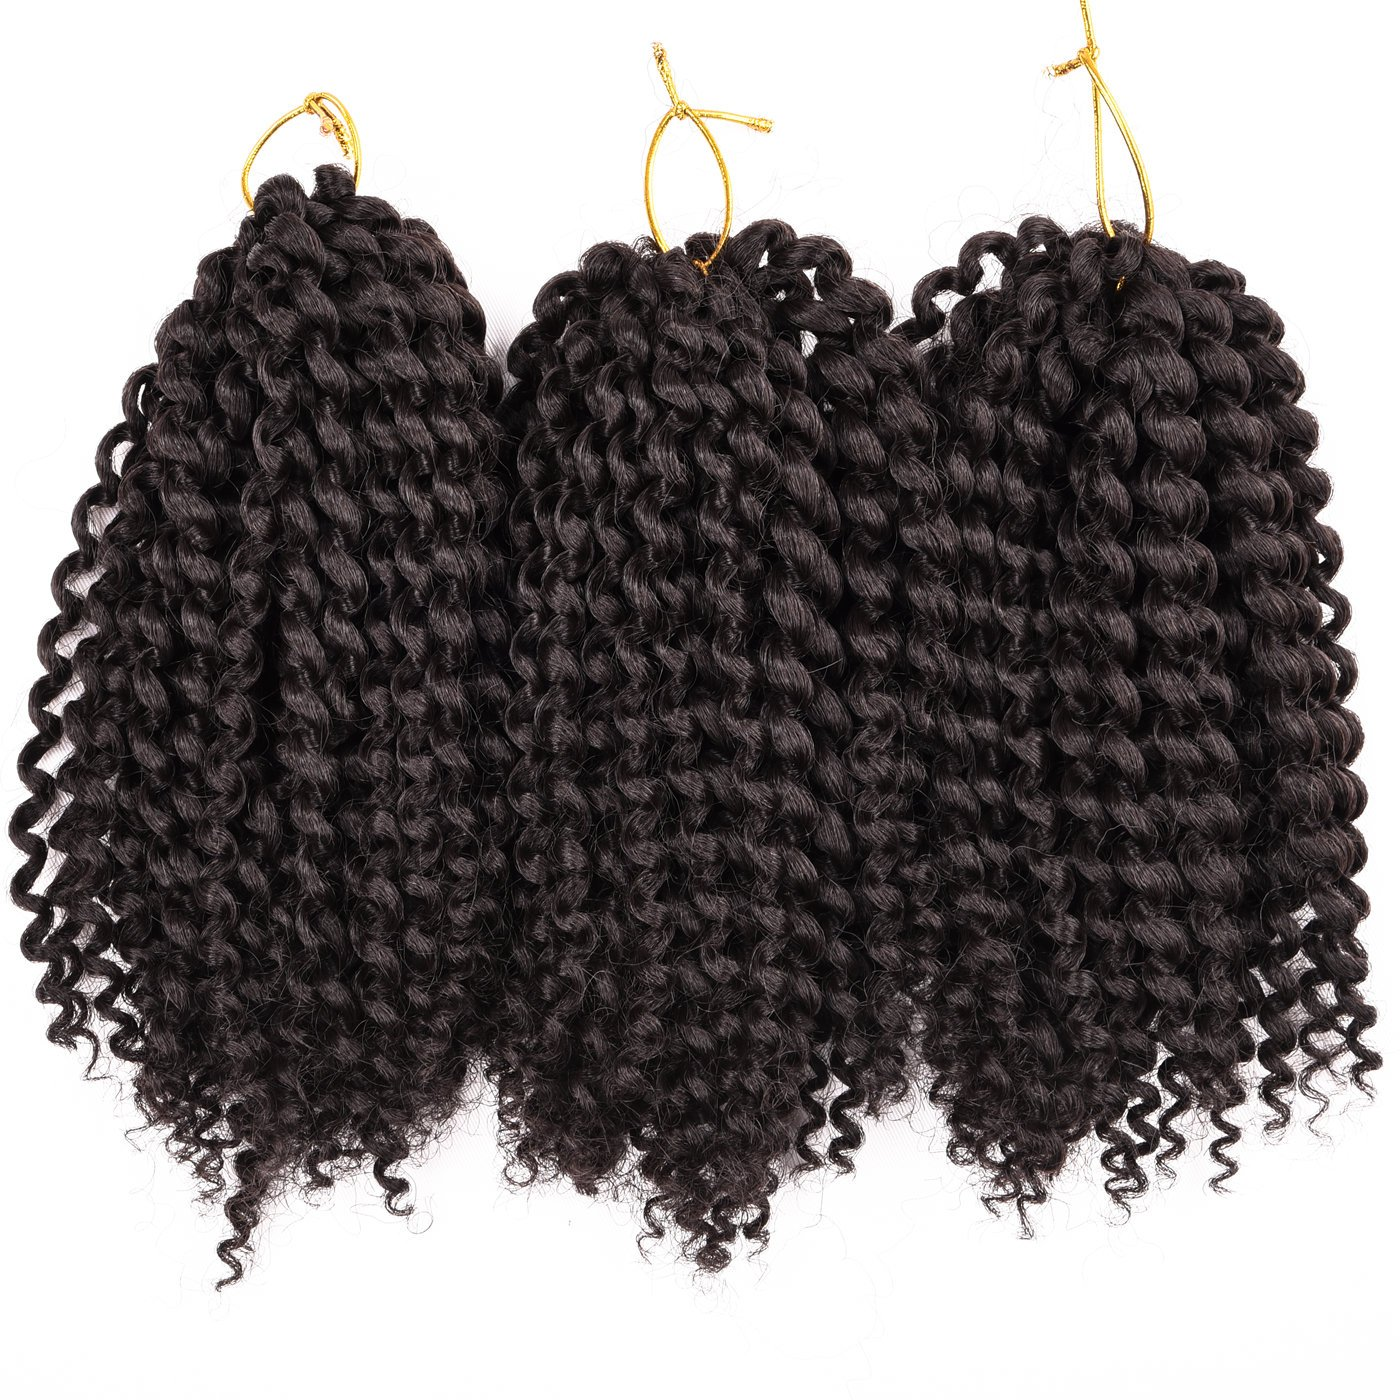 Amazon 3 packs jamaican bounce wand curl crochet hair premium 3 bundlespack marlybob kinky curl crochet hair 8 crochet braids synthetic pmusecretfo Choice Image